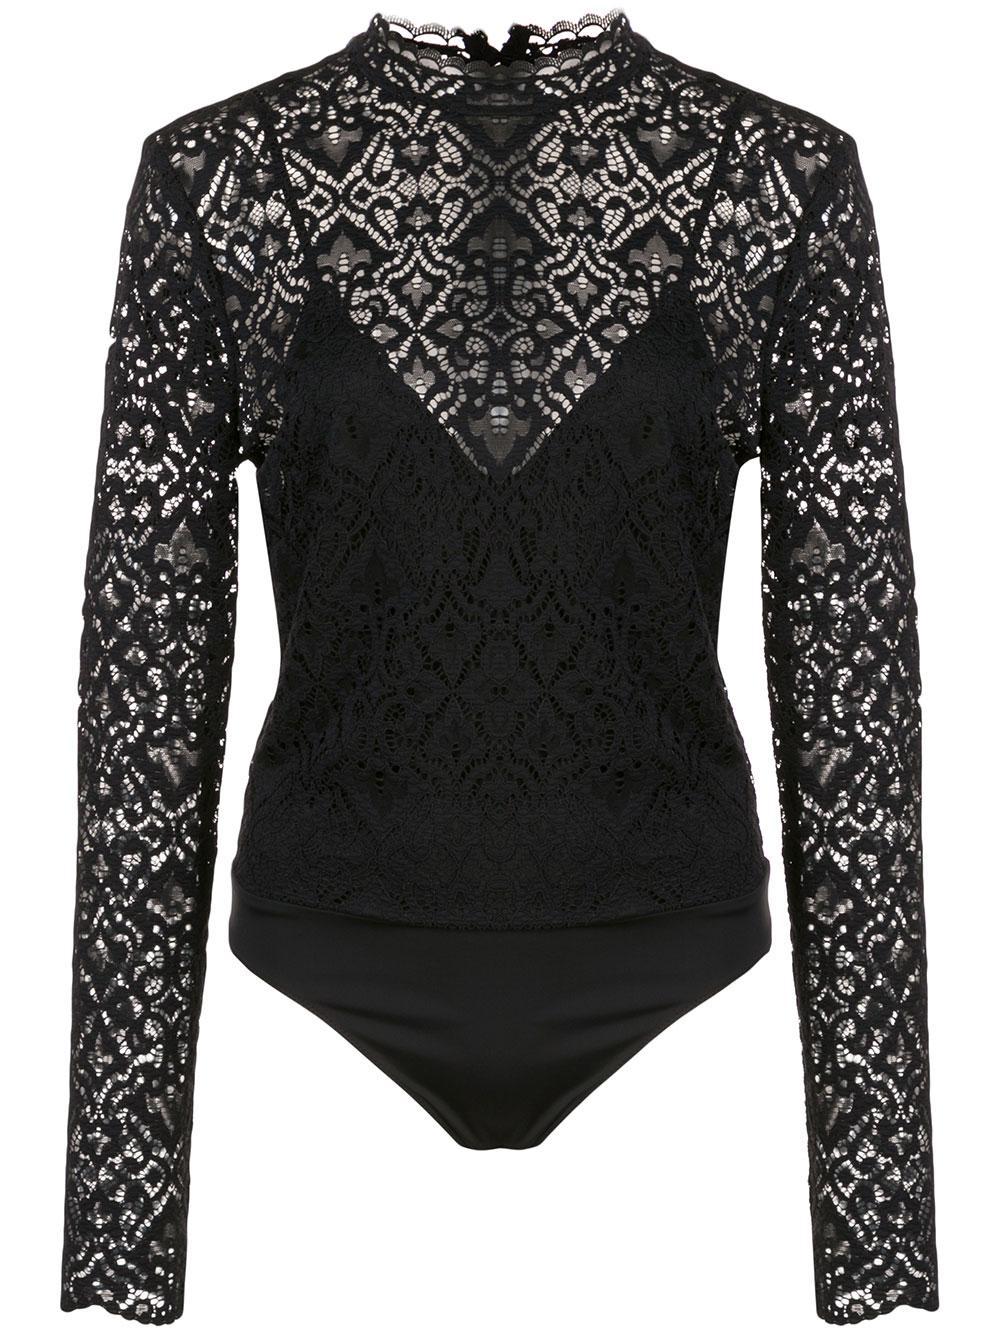 Long Sleeve Multimedia Lace Cami Bodysuit Item # 120-8018-A